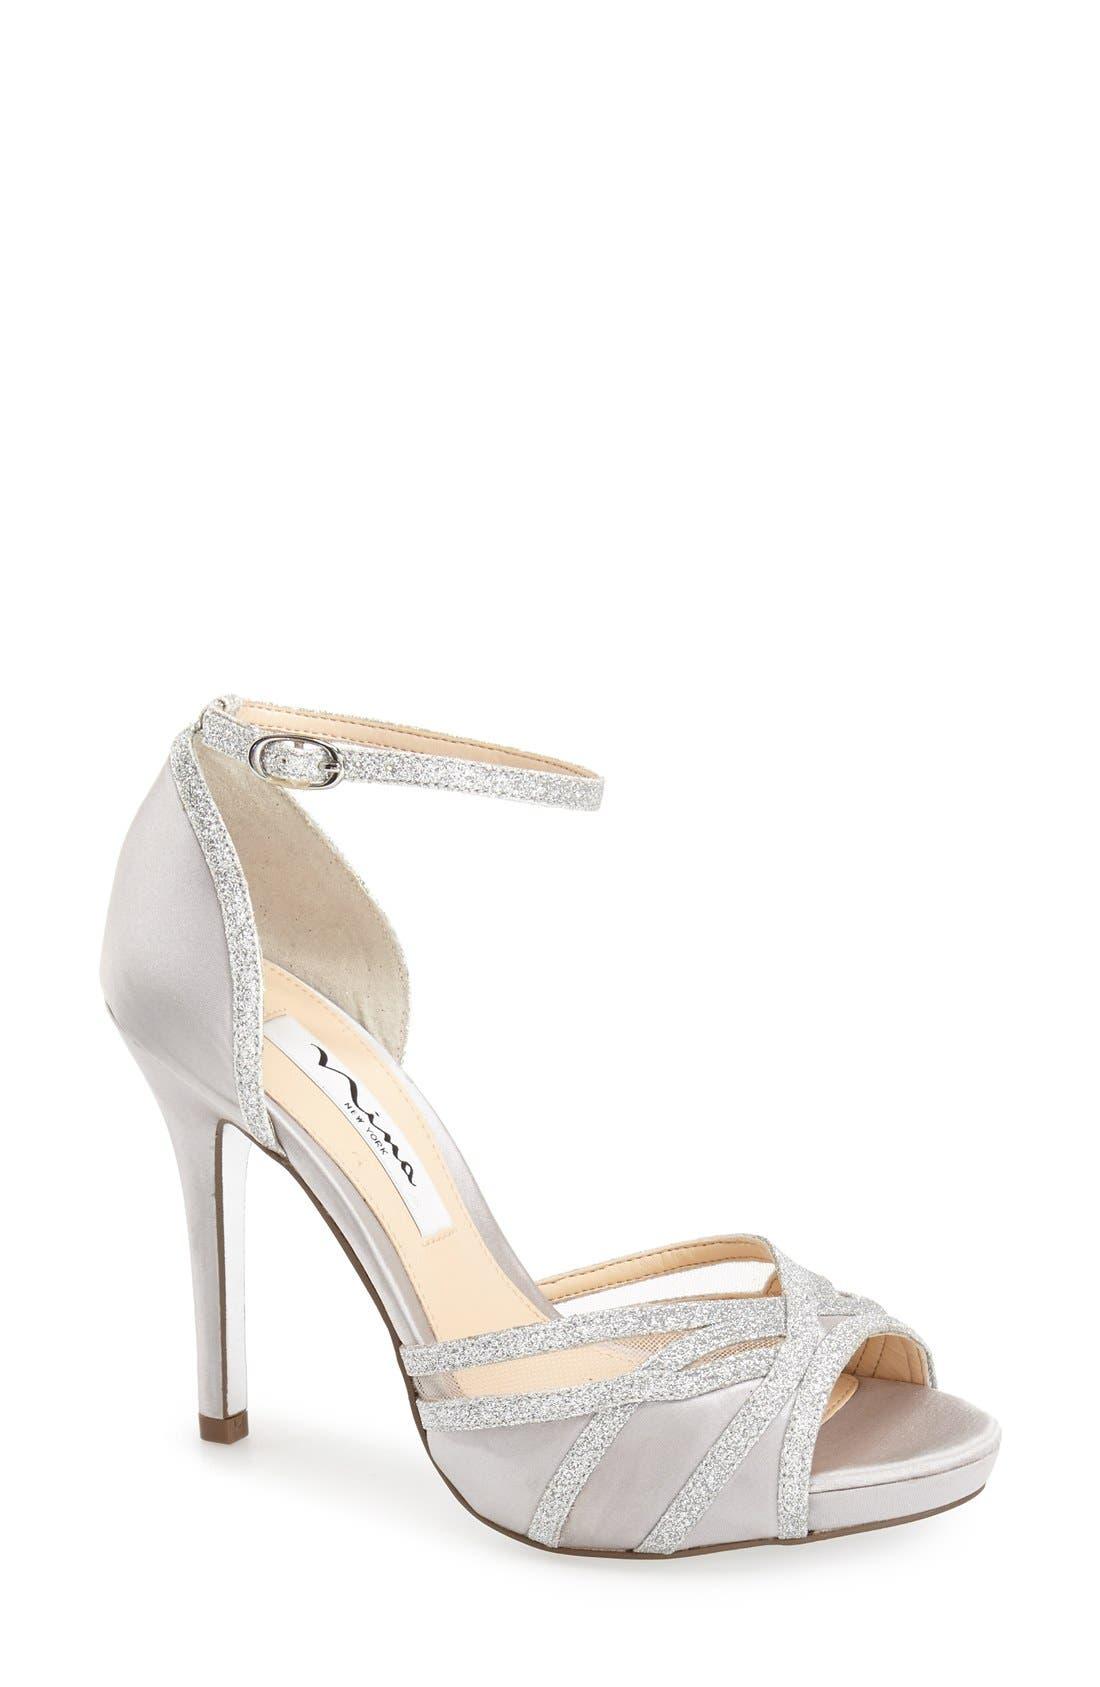 Main Image - Nina 'Kerstin' Ankle Strap Sandal (Women)